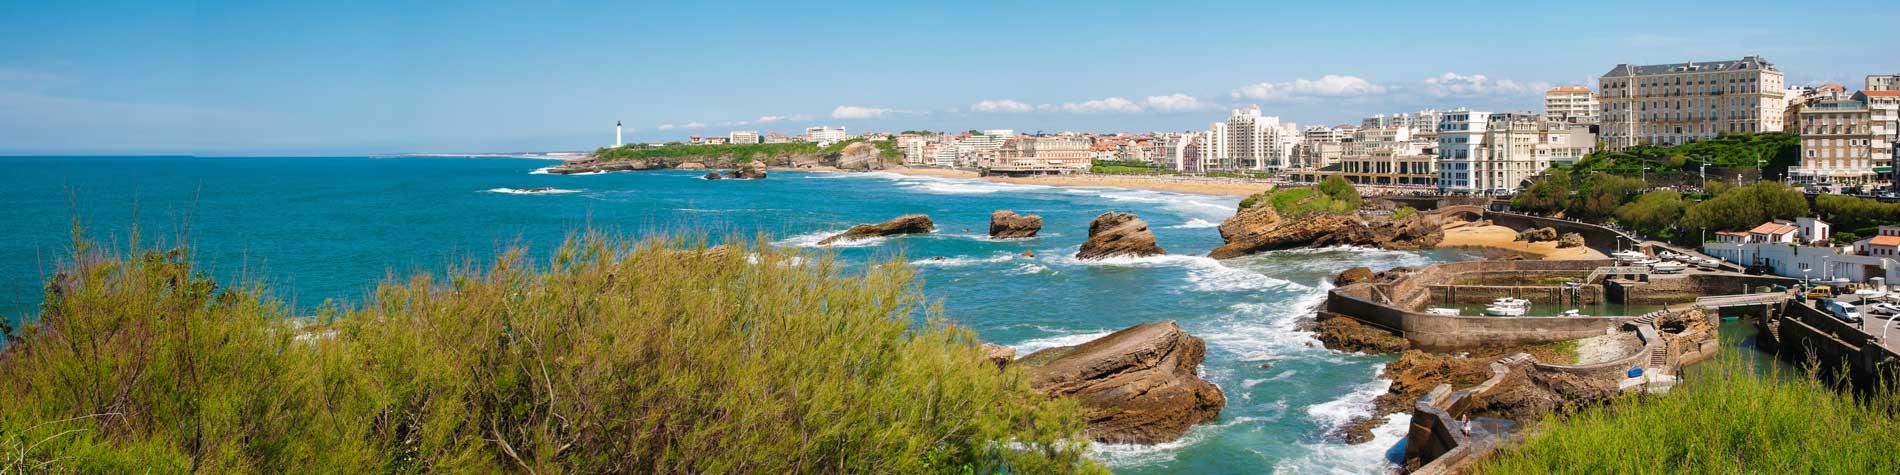 Aeroporto Tenerife Sud : Compare charleroi biarritz flights from u20ac 12.73 ryanair.com